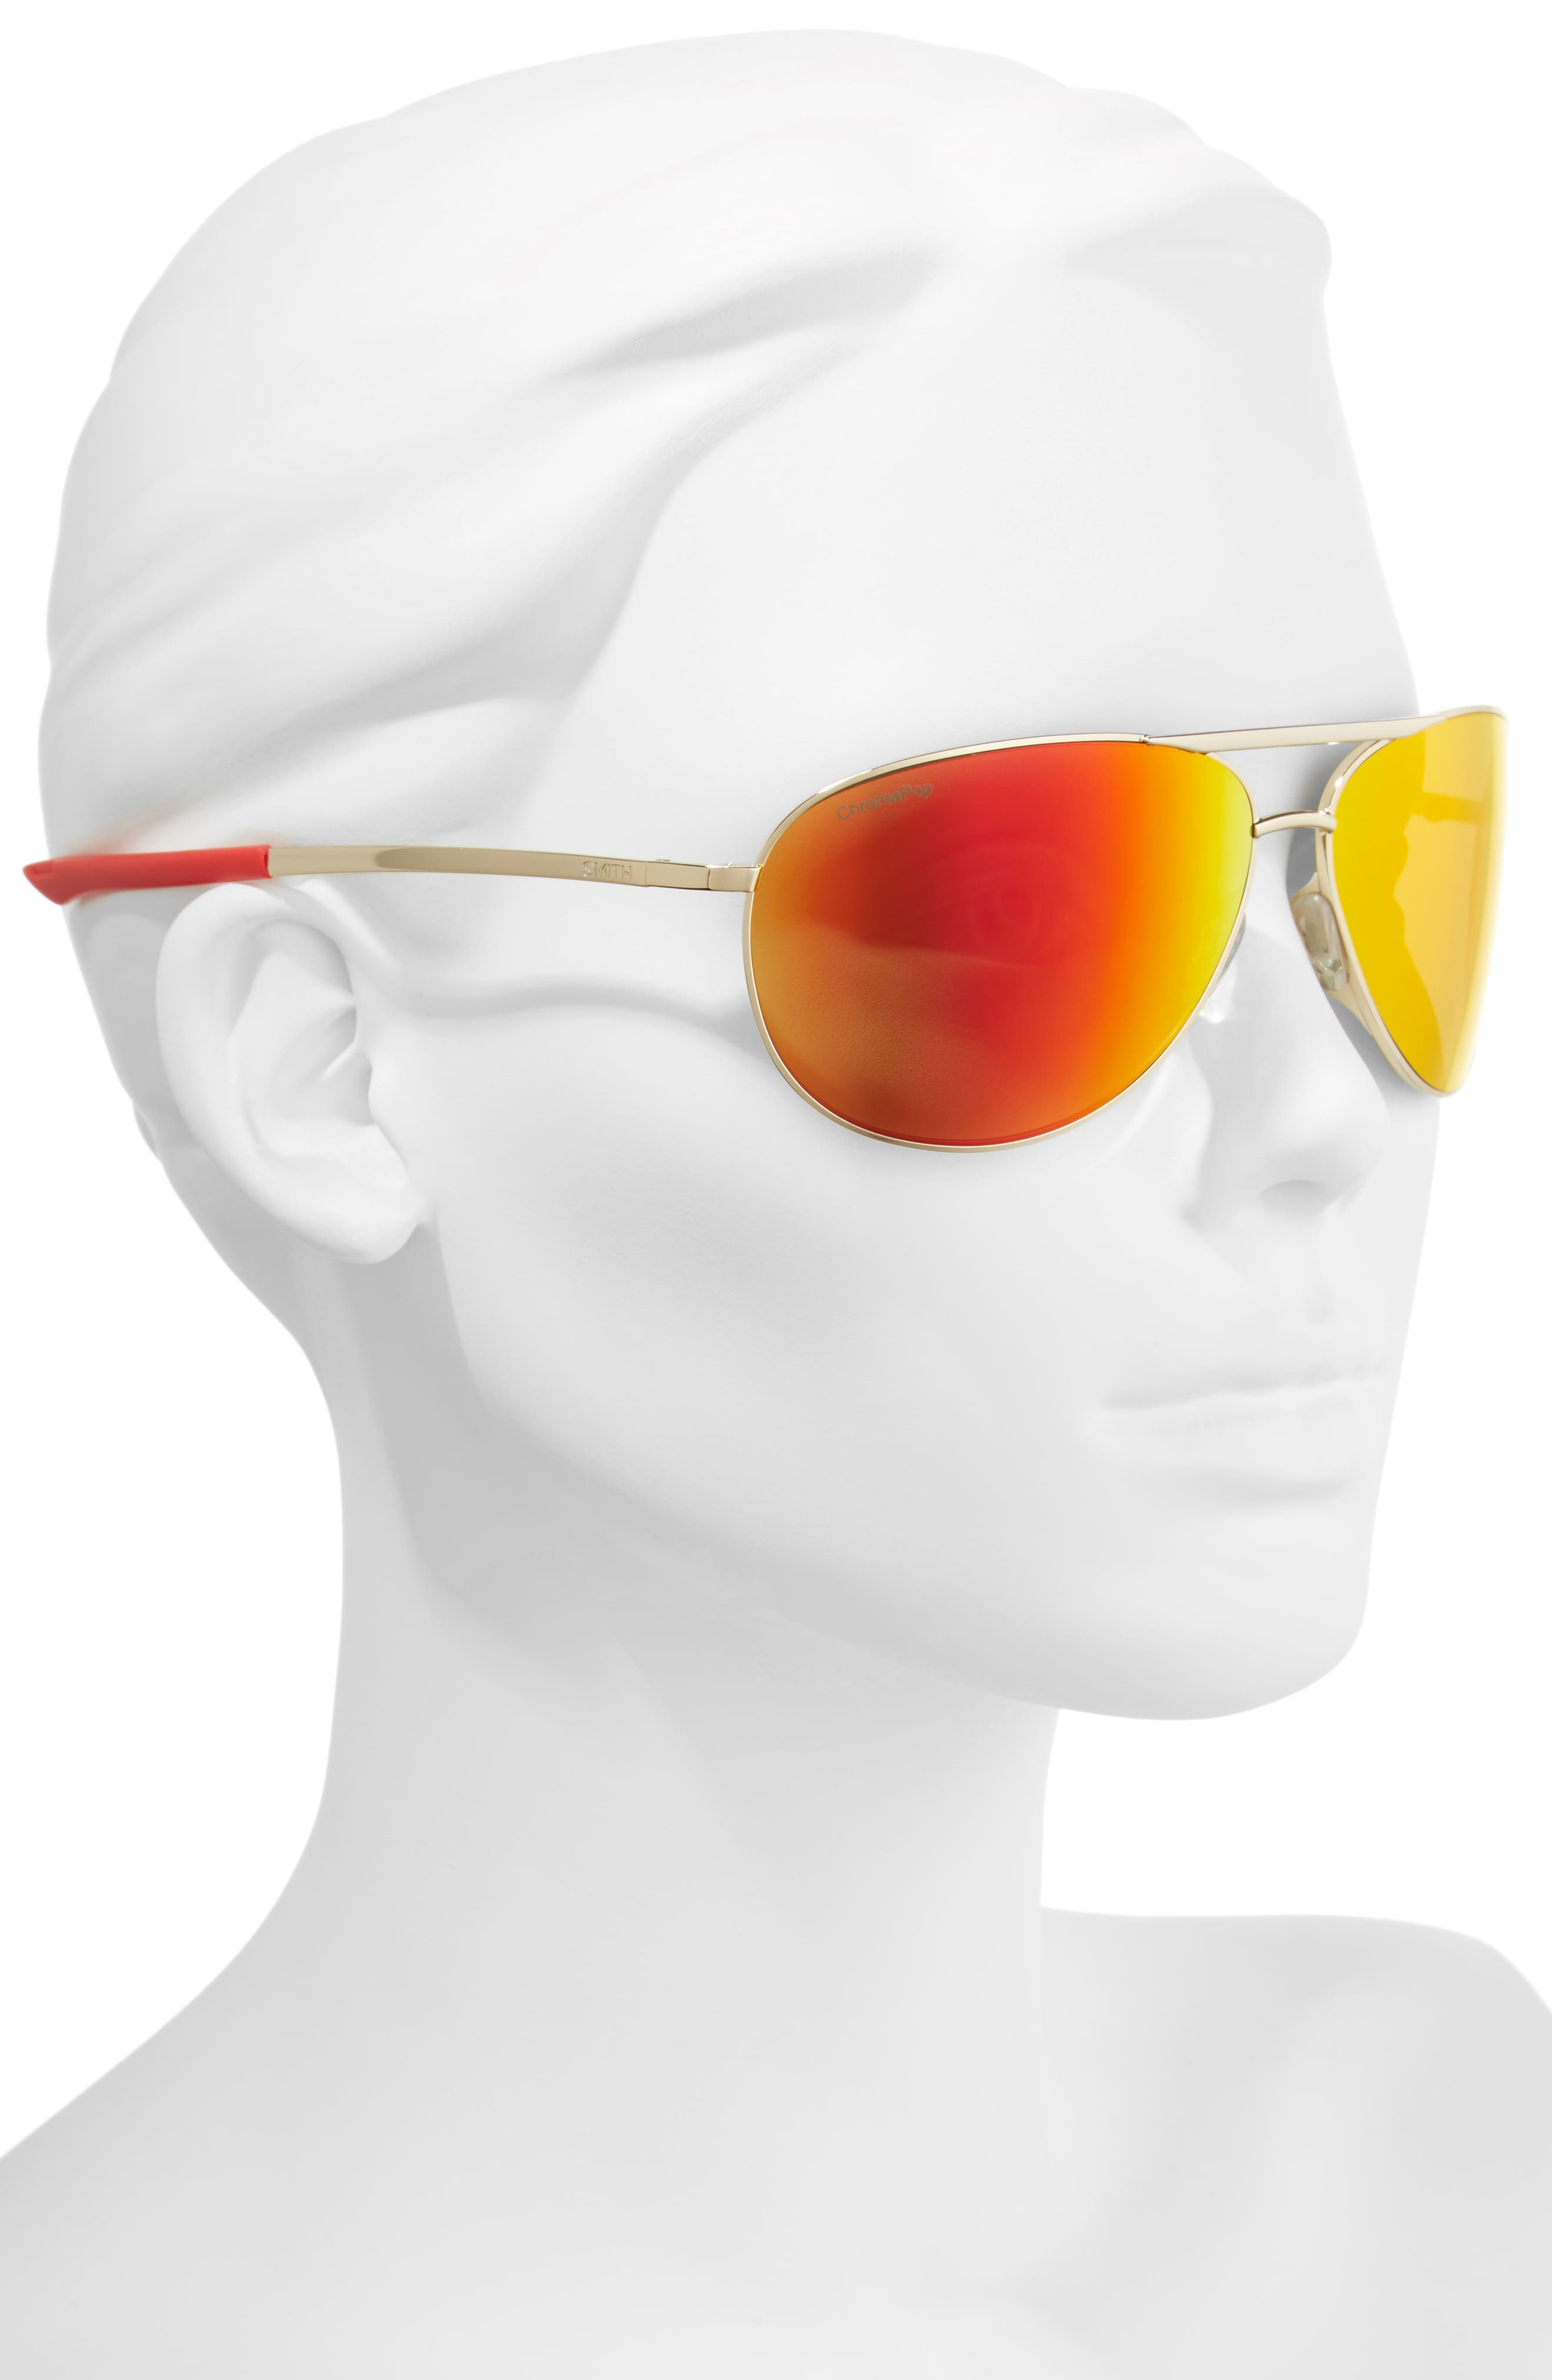 Serpico 2 65mm Mirrored ChromaPop<sup>™</sup> Polarized Aviator Sunglasses,                             Alternate thumbnail 2, color,                             710